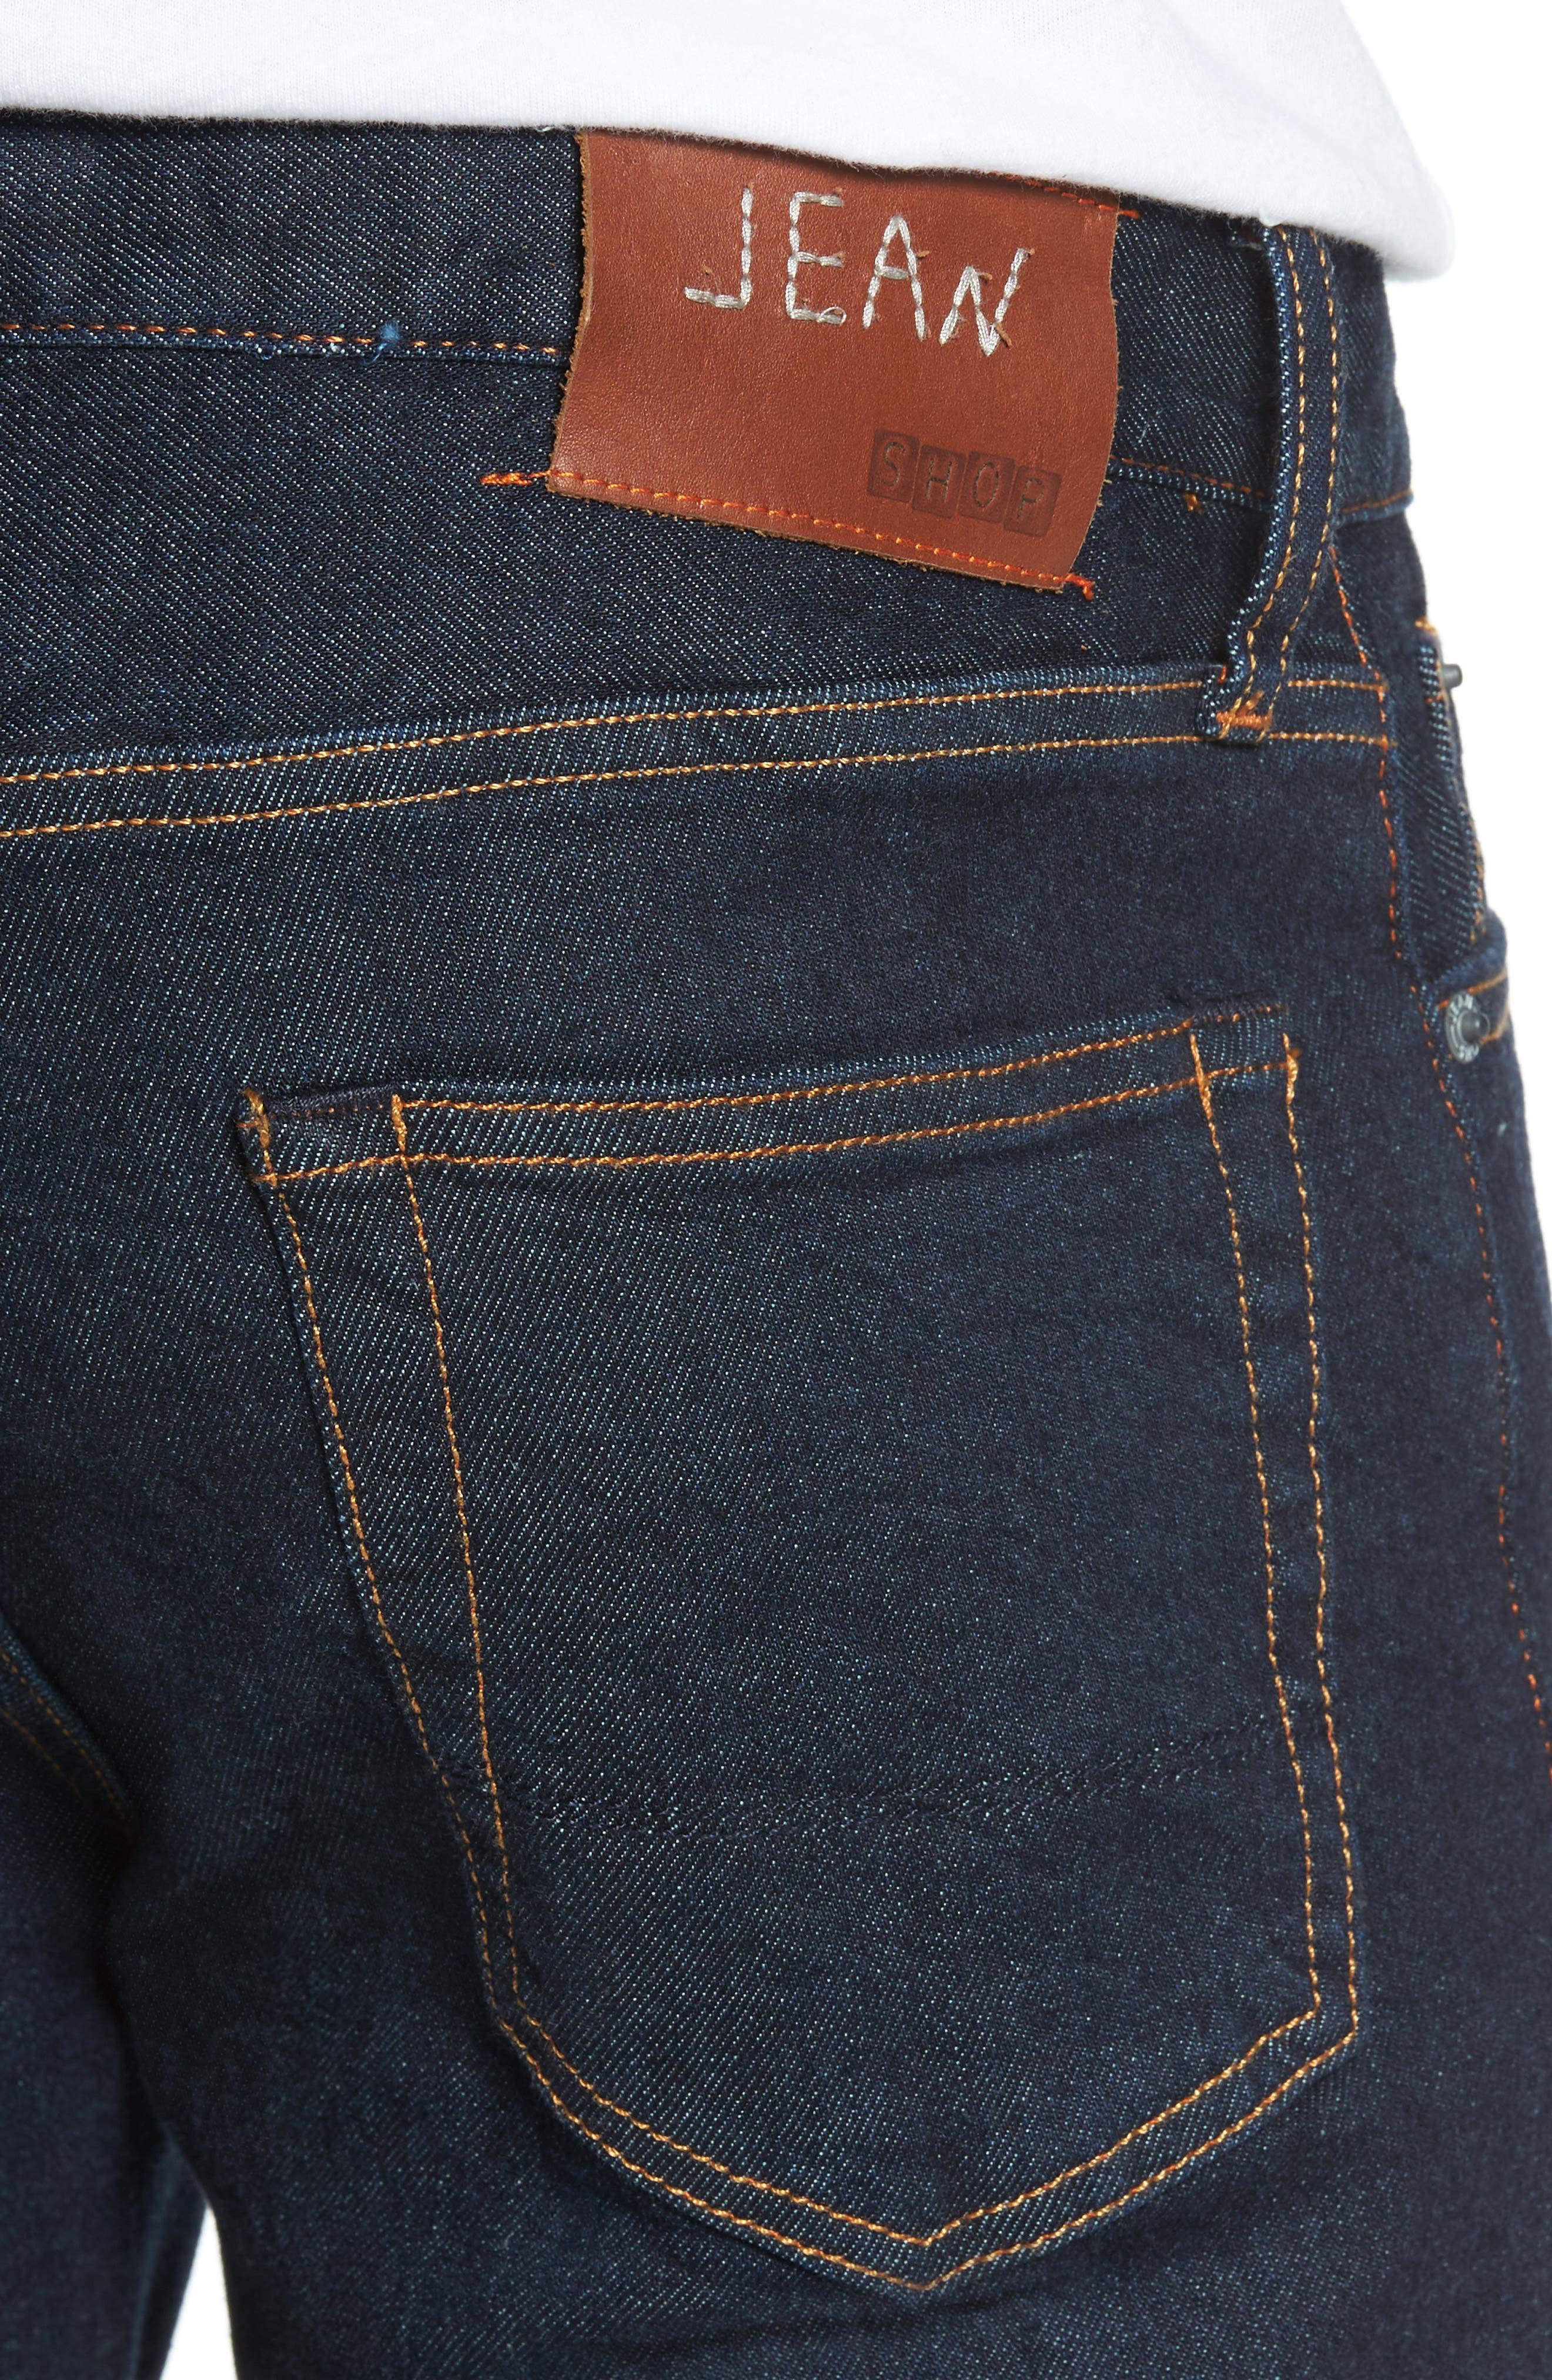 Alternate Image 4  - Jean Shop Jim Slim Fit Selvedge Jeans (Stretch Rinse)